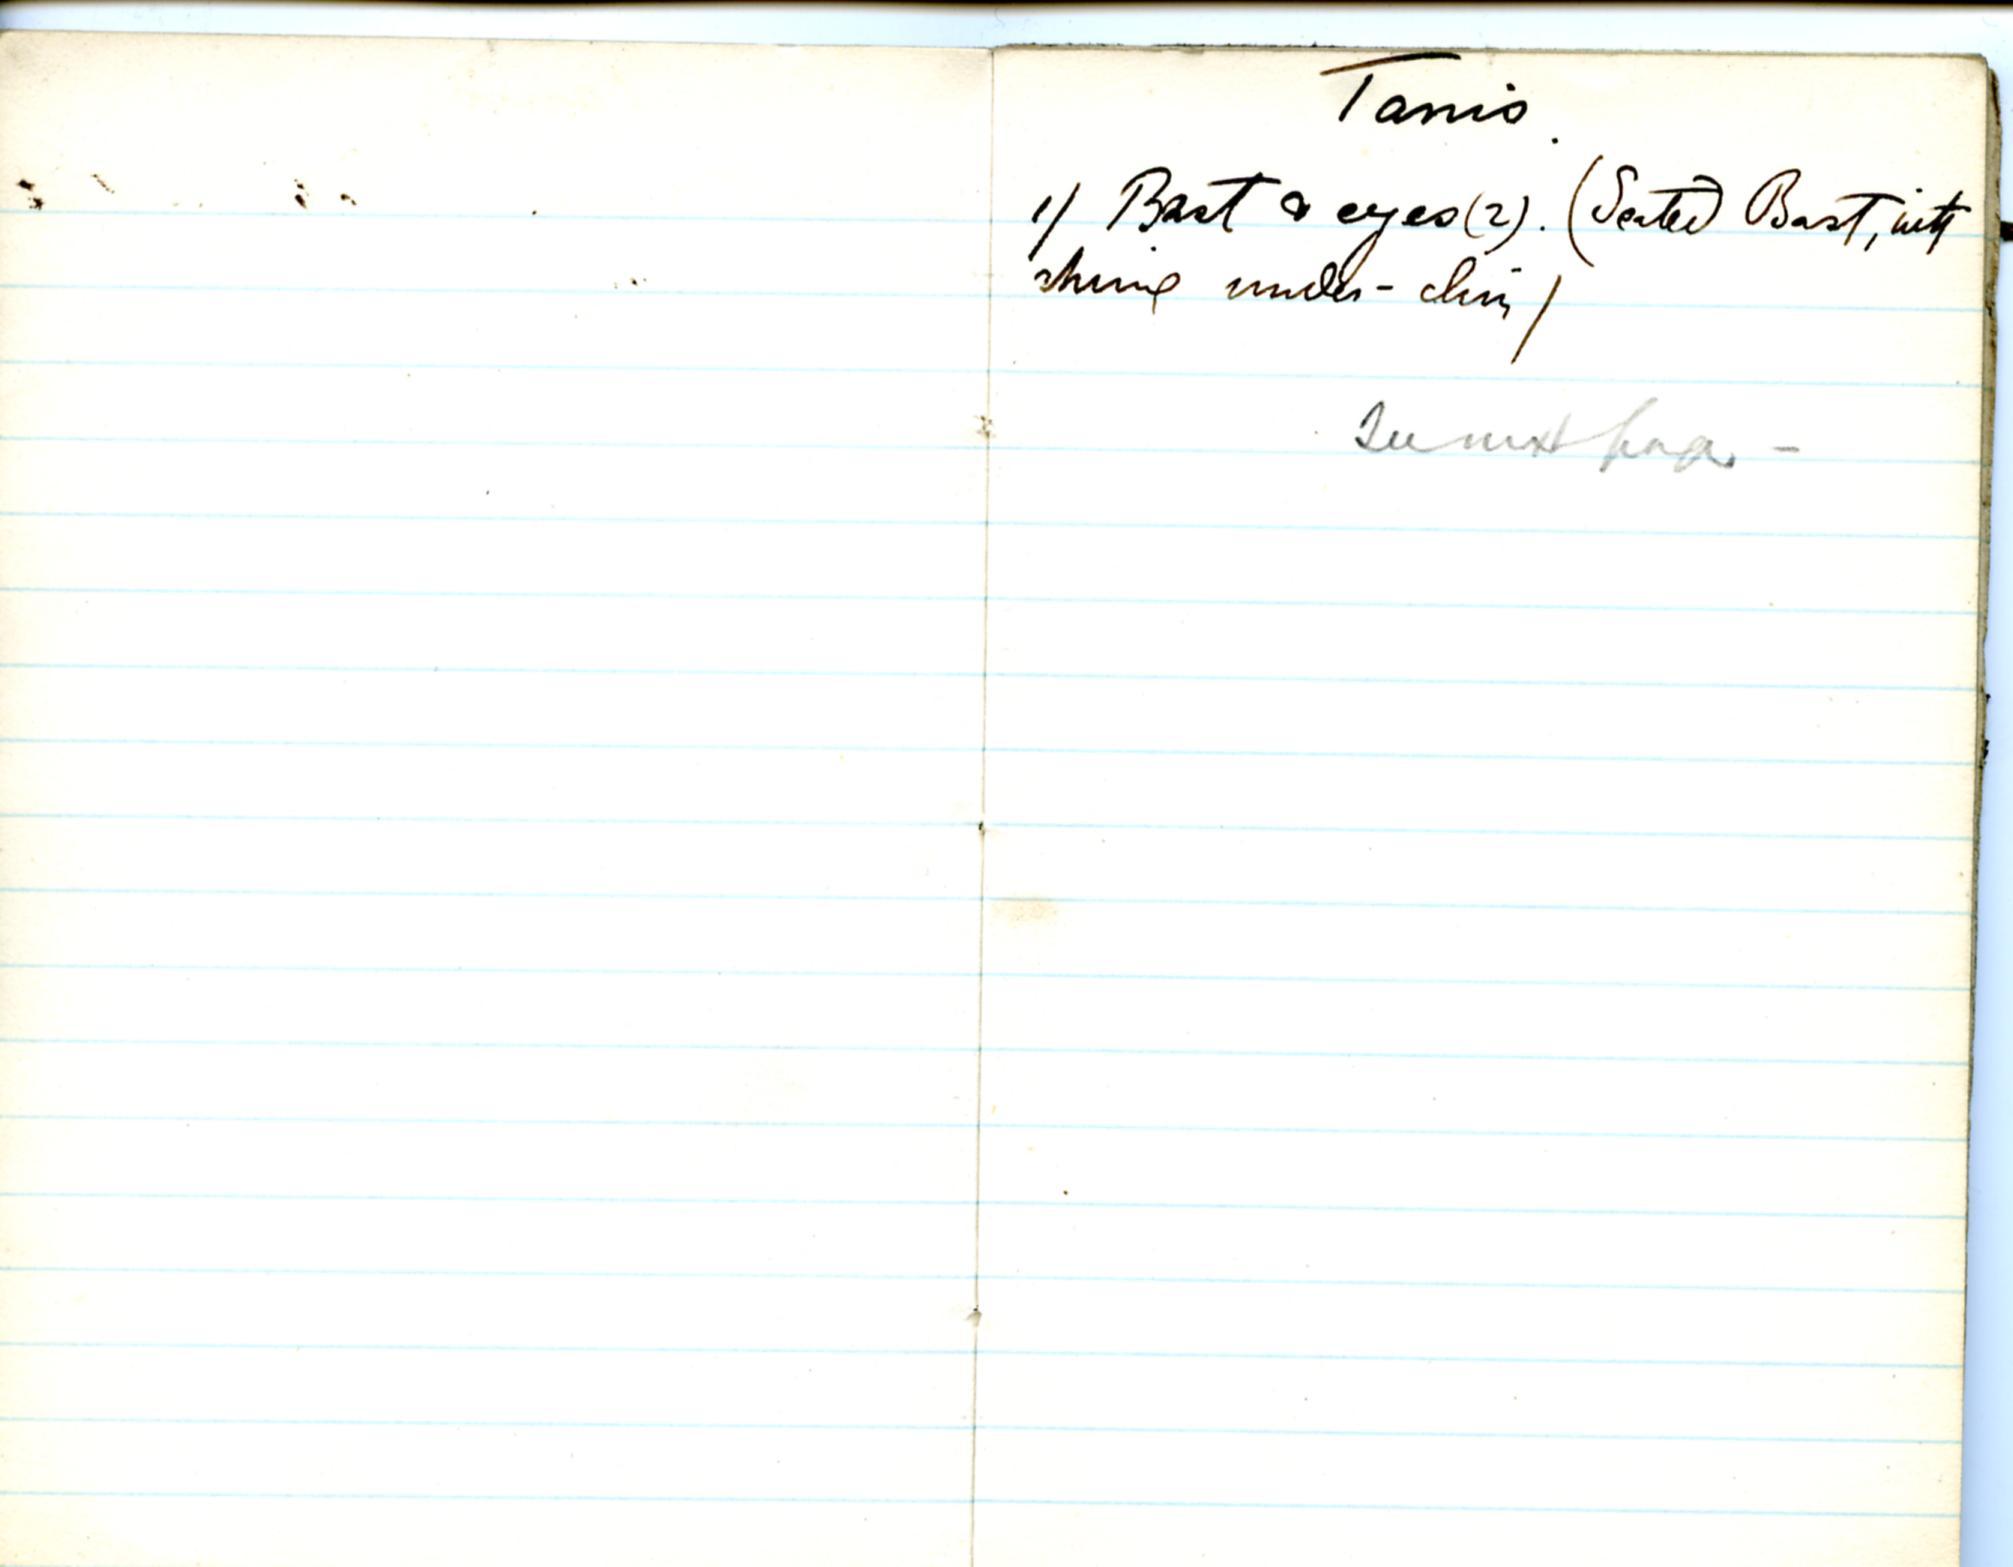 1884-85 Naukratis, Tanis, Bubastis, Tell el-Yahudiya, Nebesheh, Tell Dafana, Tell Sueilin, Tell el-Maskuta DIST.10.01g